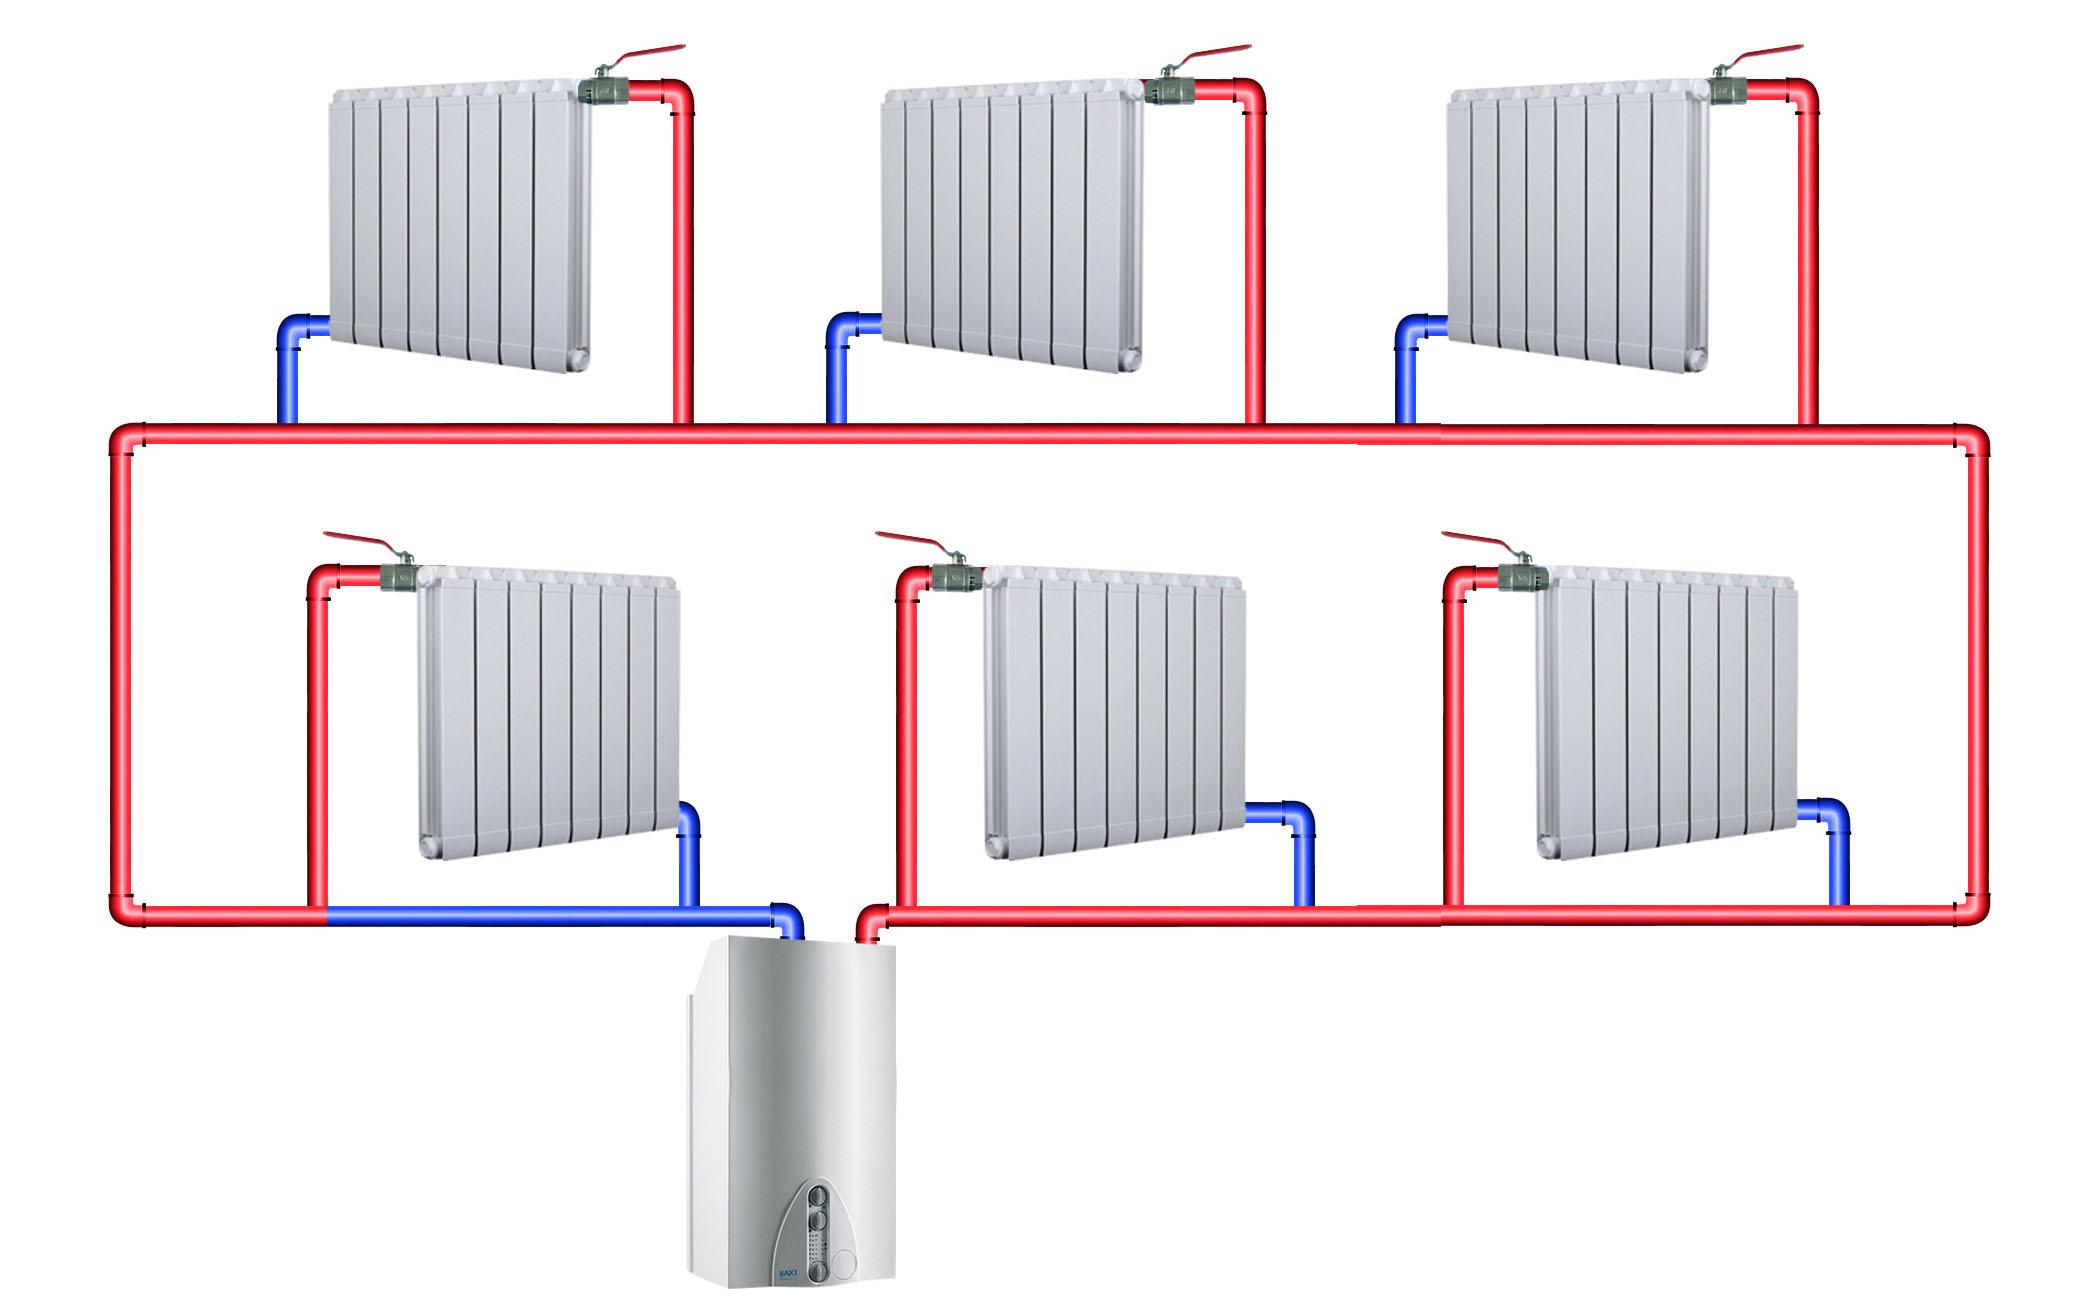 chauffage gaz kemper angers aubervilliers antony simulation cout construction maison. Black Bedroom Furniture Sets. Home Design Ideas